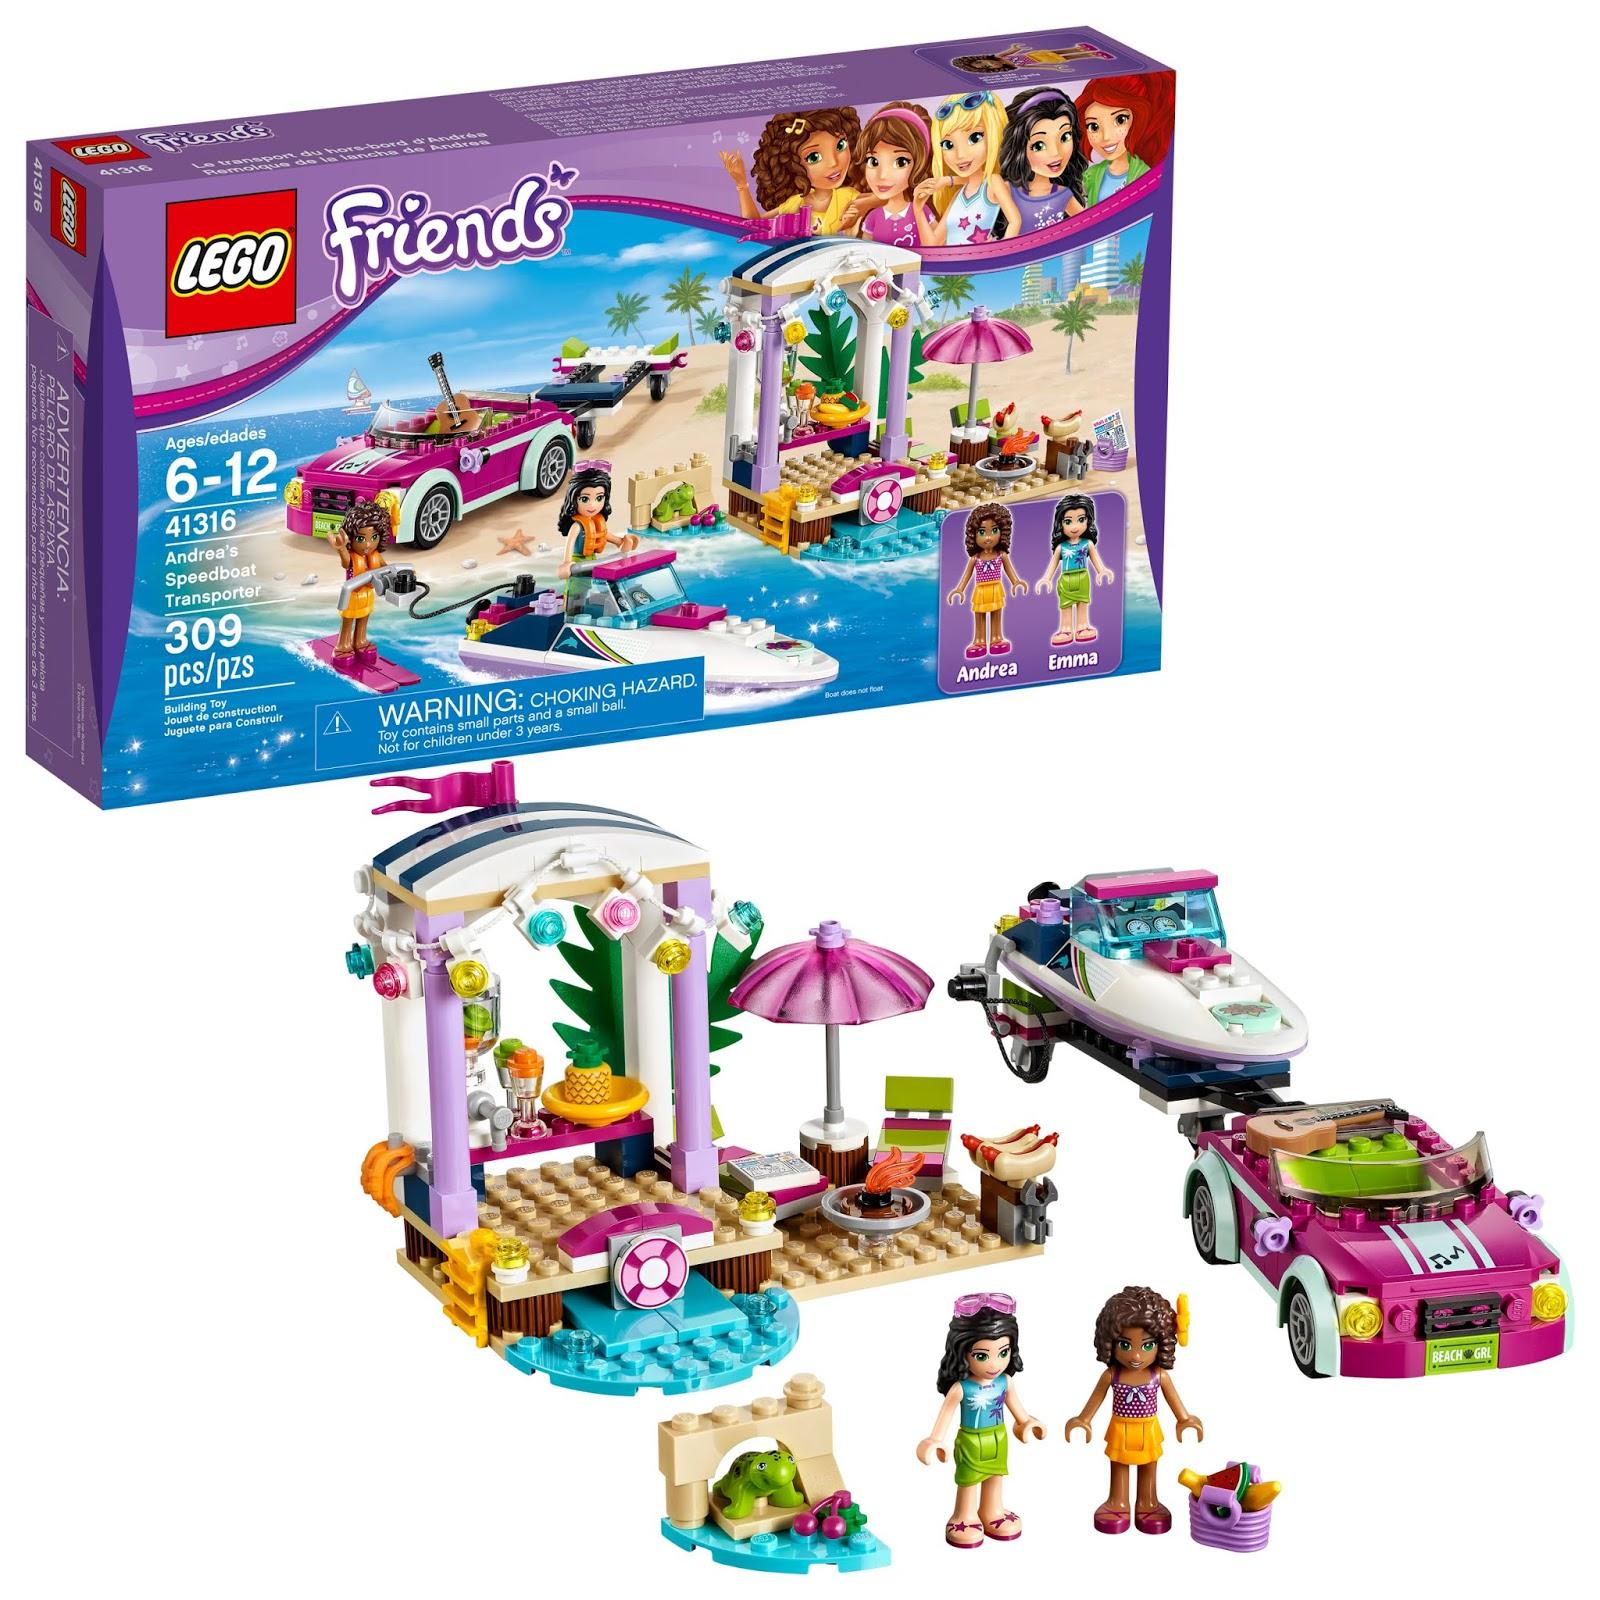 Lego Beach House Walmart: Walmart: LEGO Friends Andrea's Speedboat Transporter $17